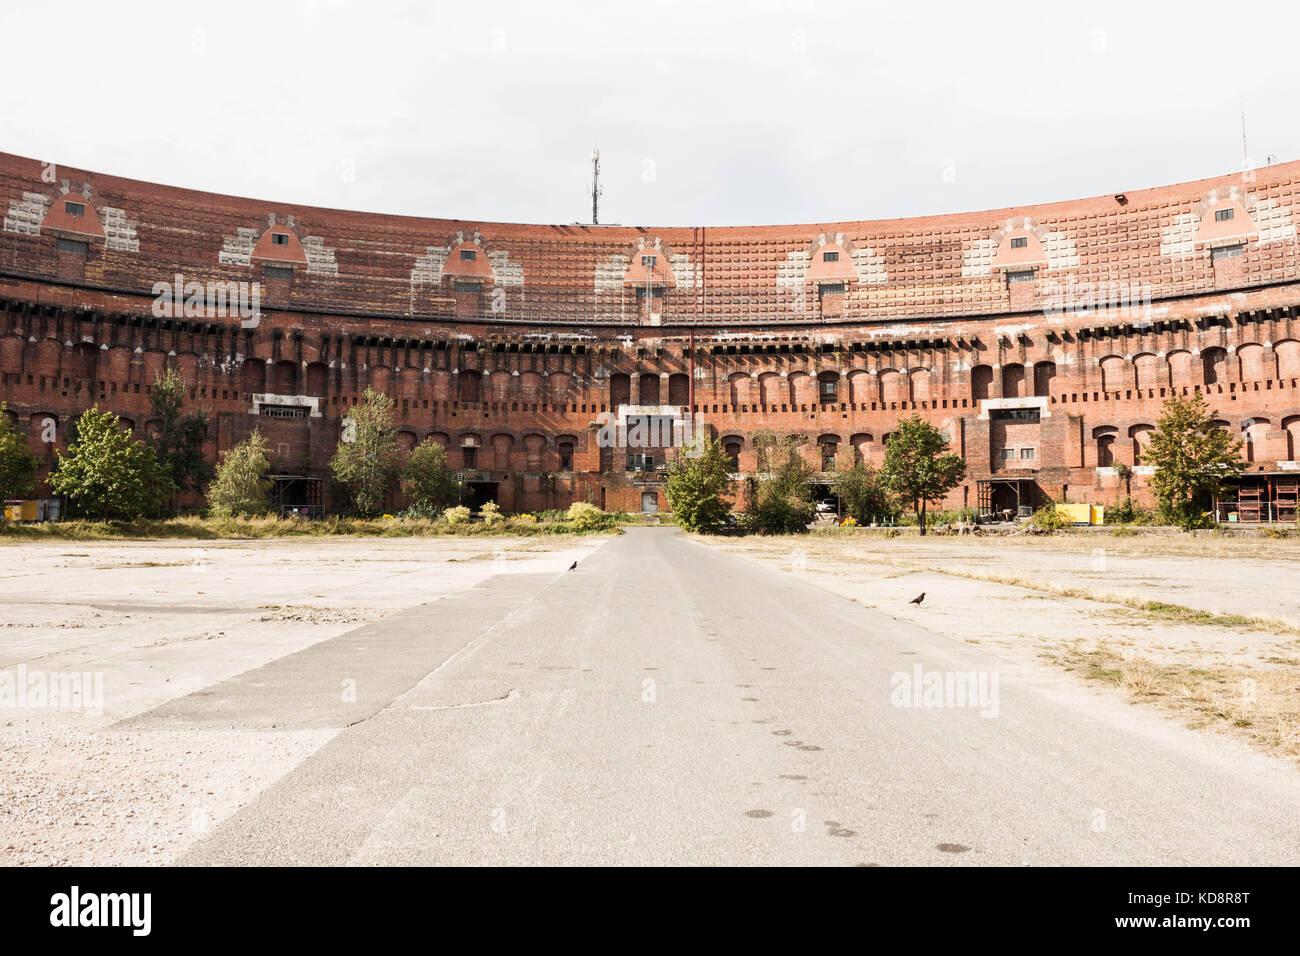 Nuremberg, Germany - August 28, 2016: Former Nazi Congress hall (Kongresshalle) building in Nuremberg, Germany. Stock Photo